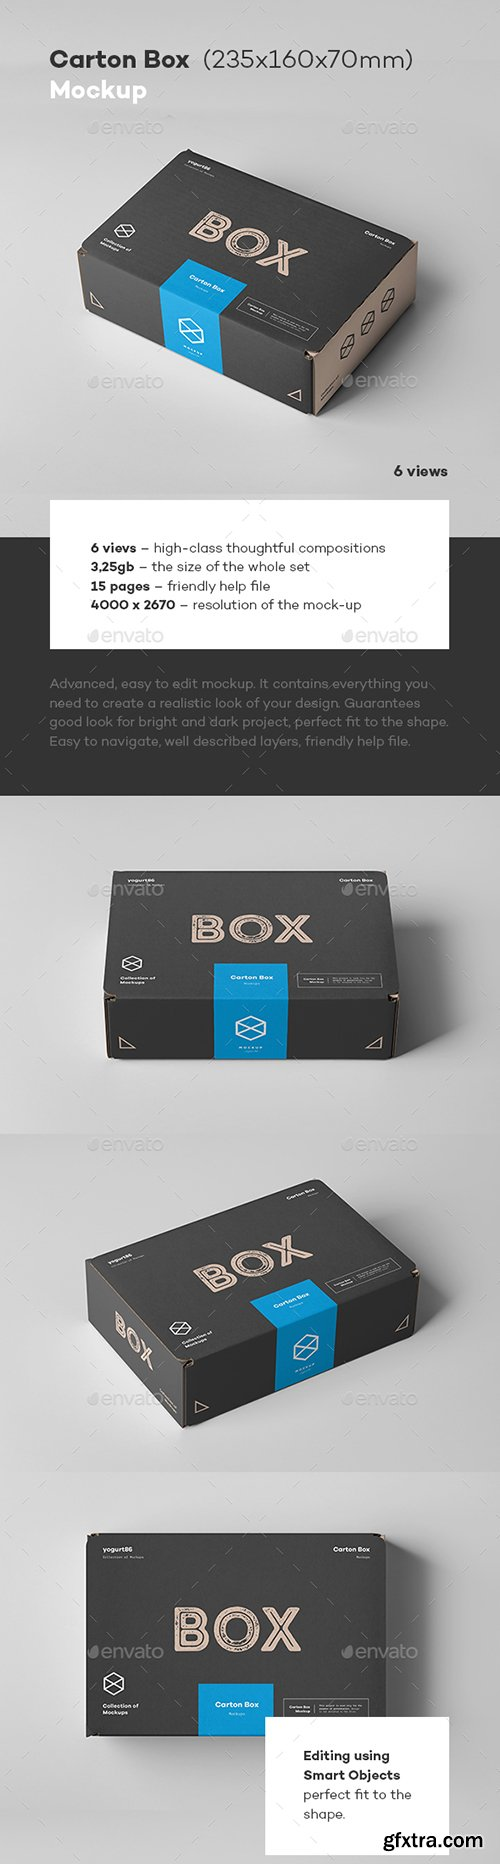 Graphicriver - Carton Box Mock-up 235x160x70 22851017